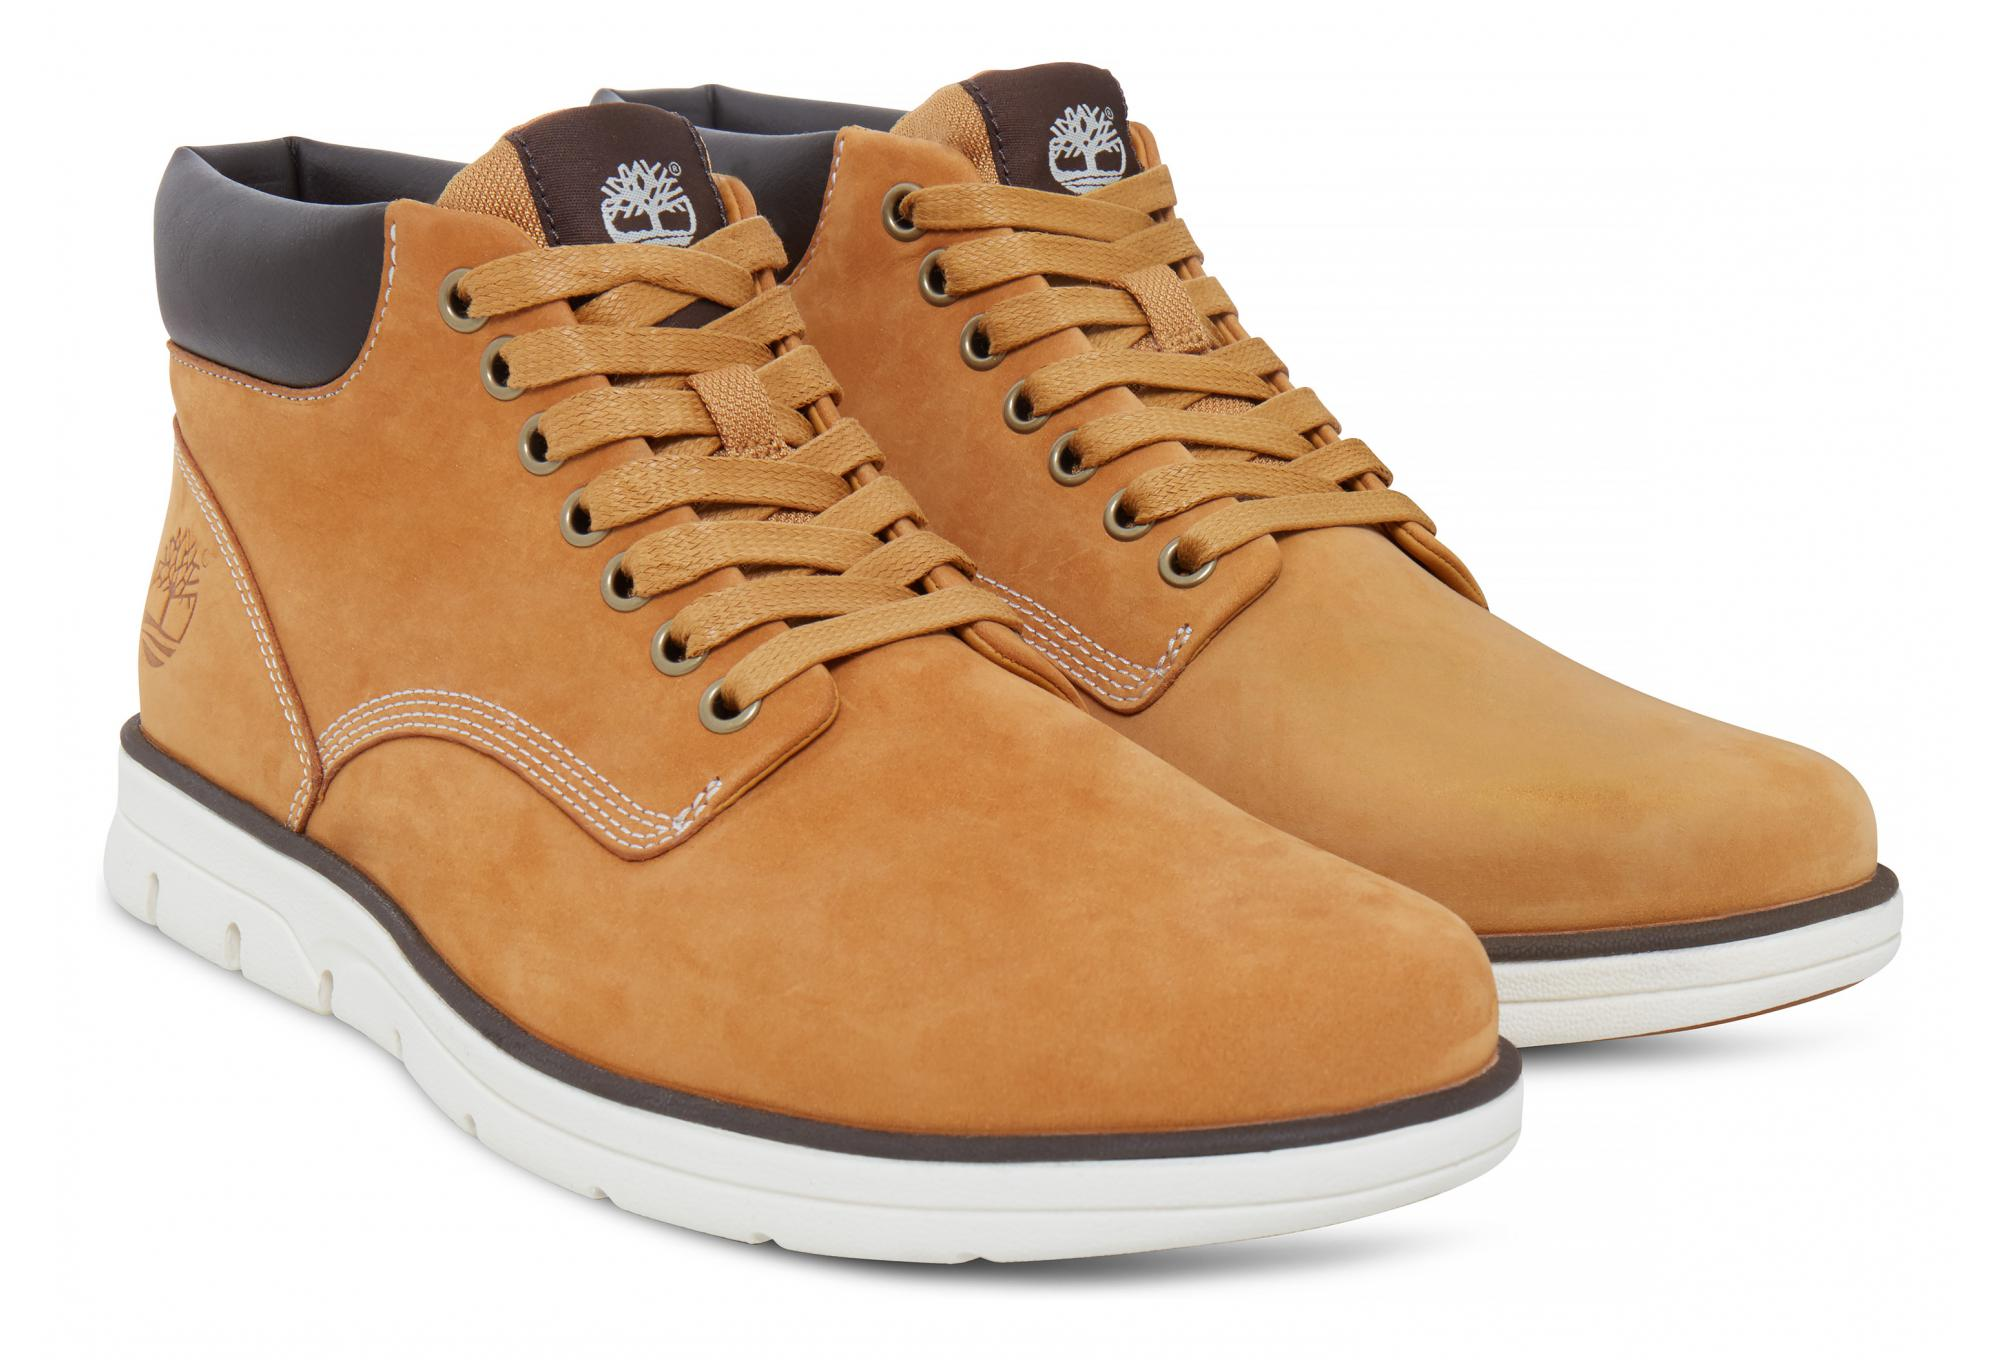 Timberland Shoes Bradstreet Chukka Beige   White  b39262b0580